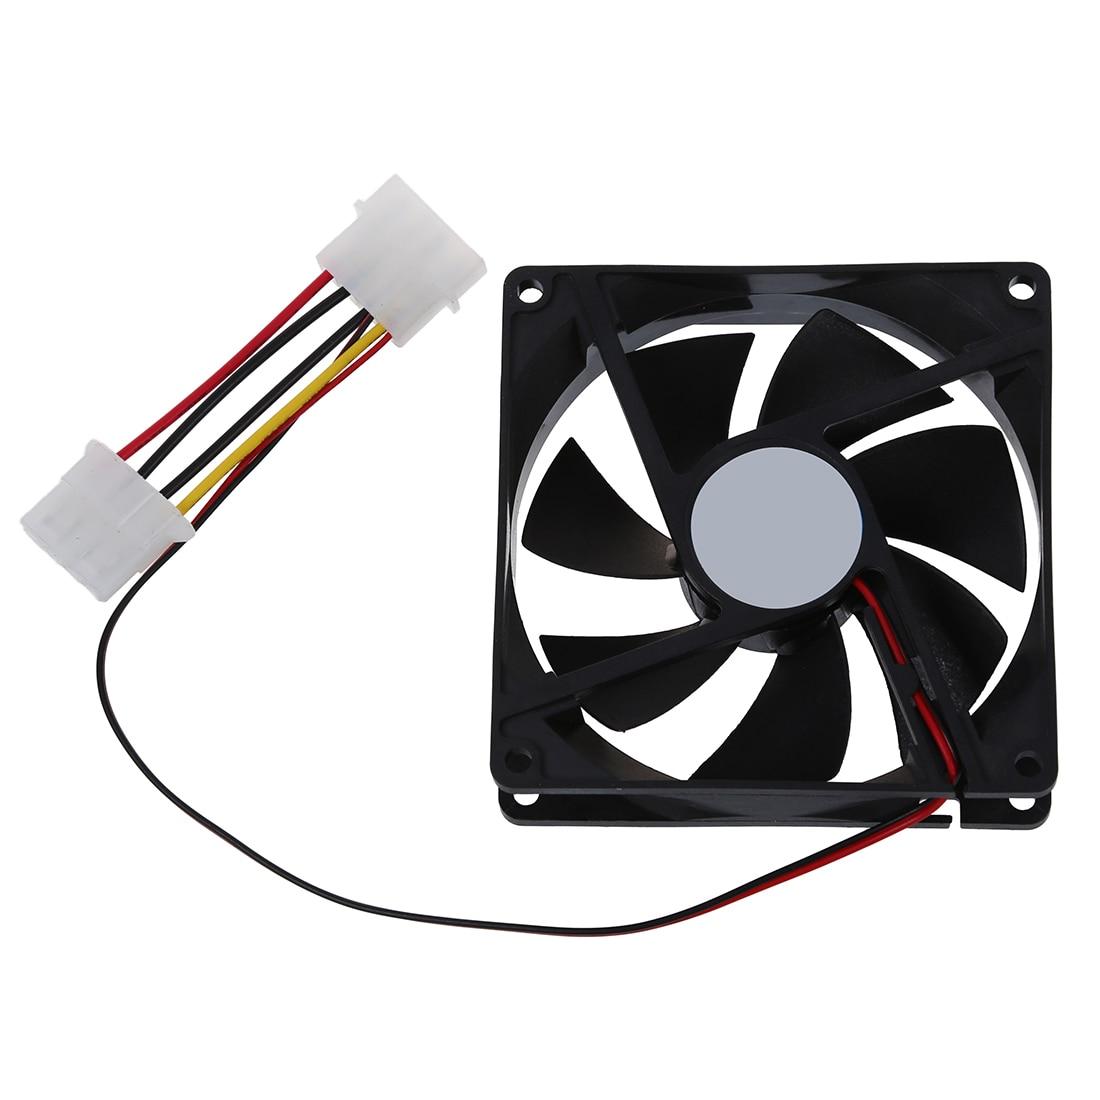 DC 12V 4 Pin Black Plastic PC Cooling Fan 90mm x 90mm x 25mm